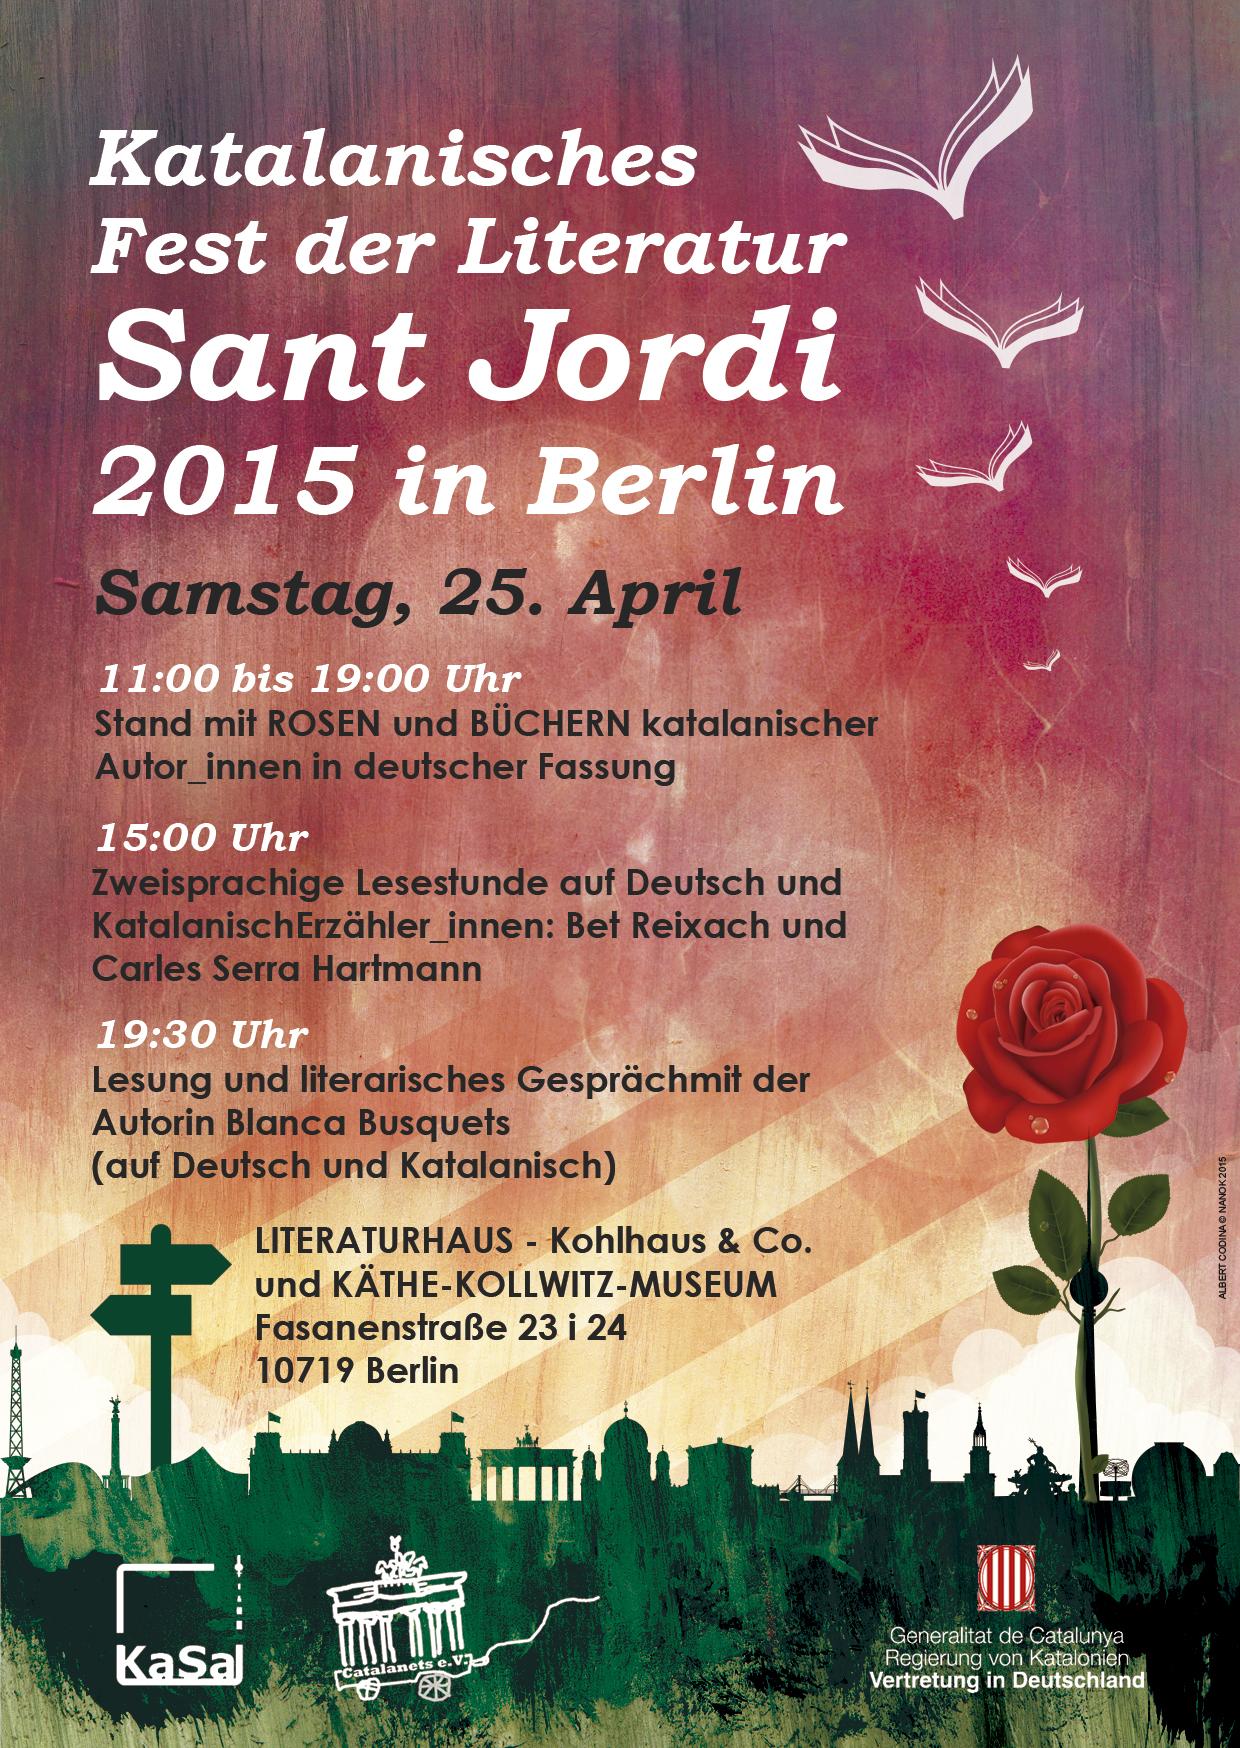 SantJordi2015-Berlin-DE2